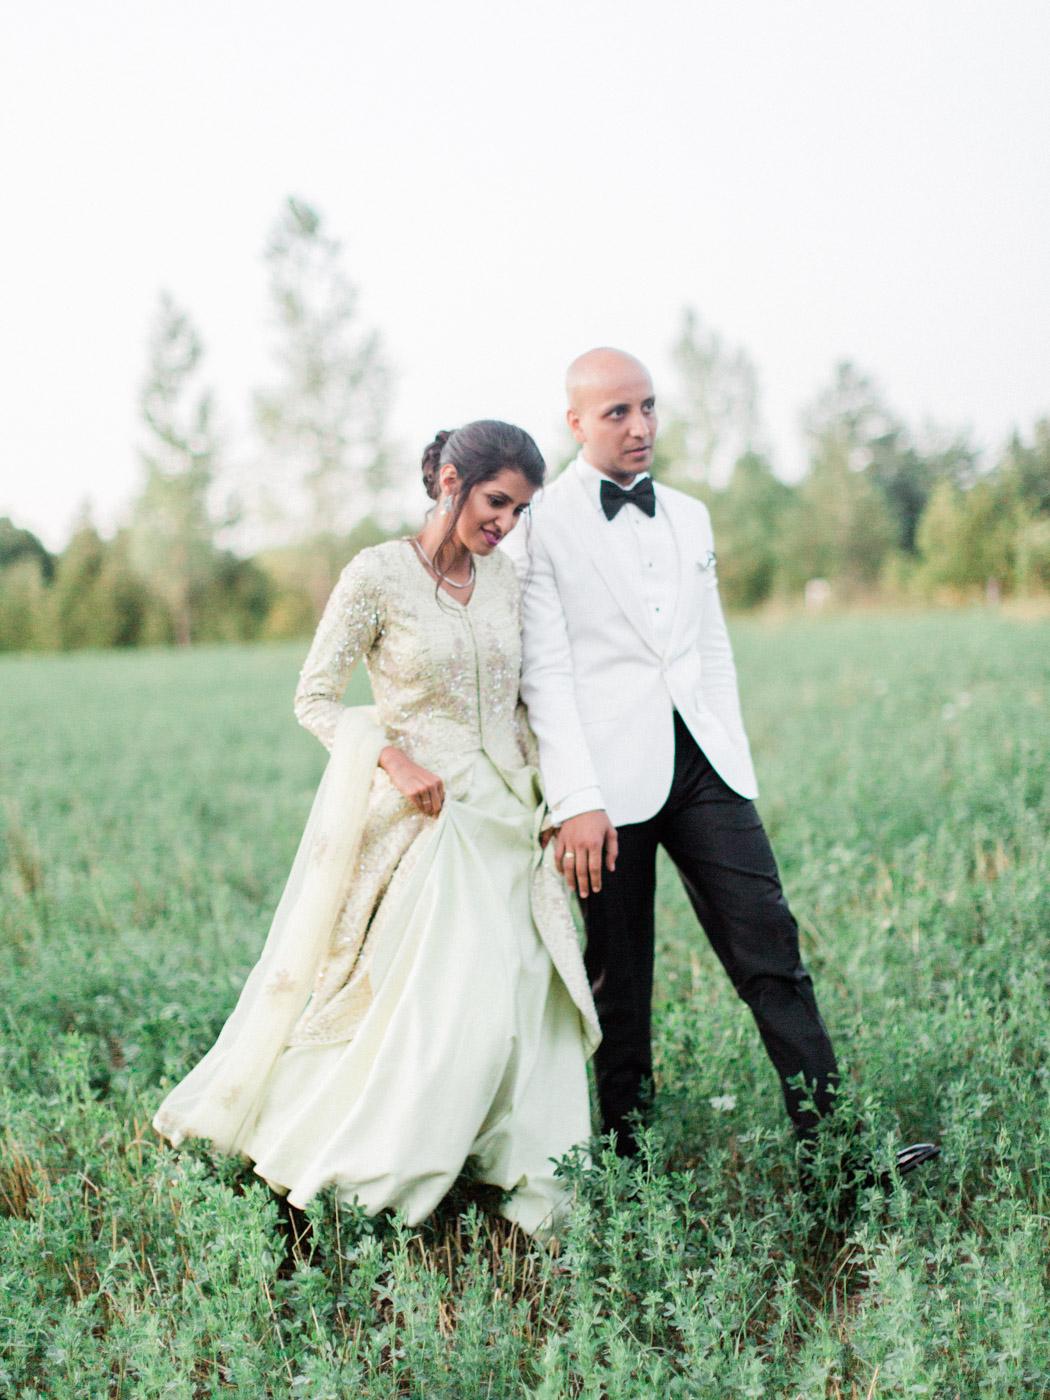 Toronto-Collingwood-wedding-photographer-indian-wedding-documentary182.jpg